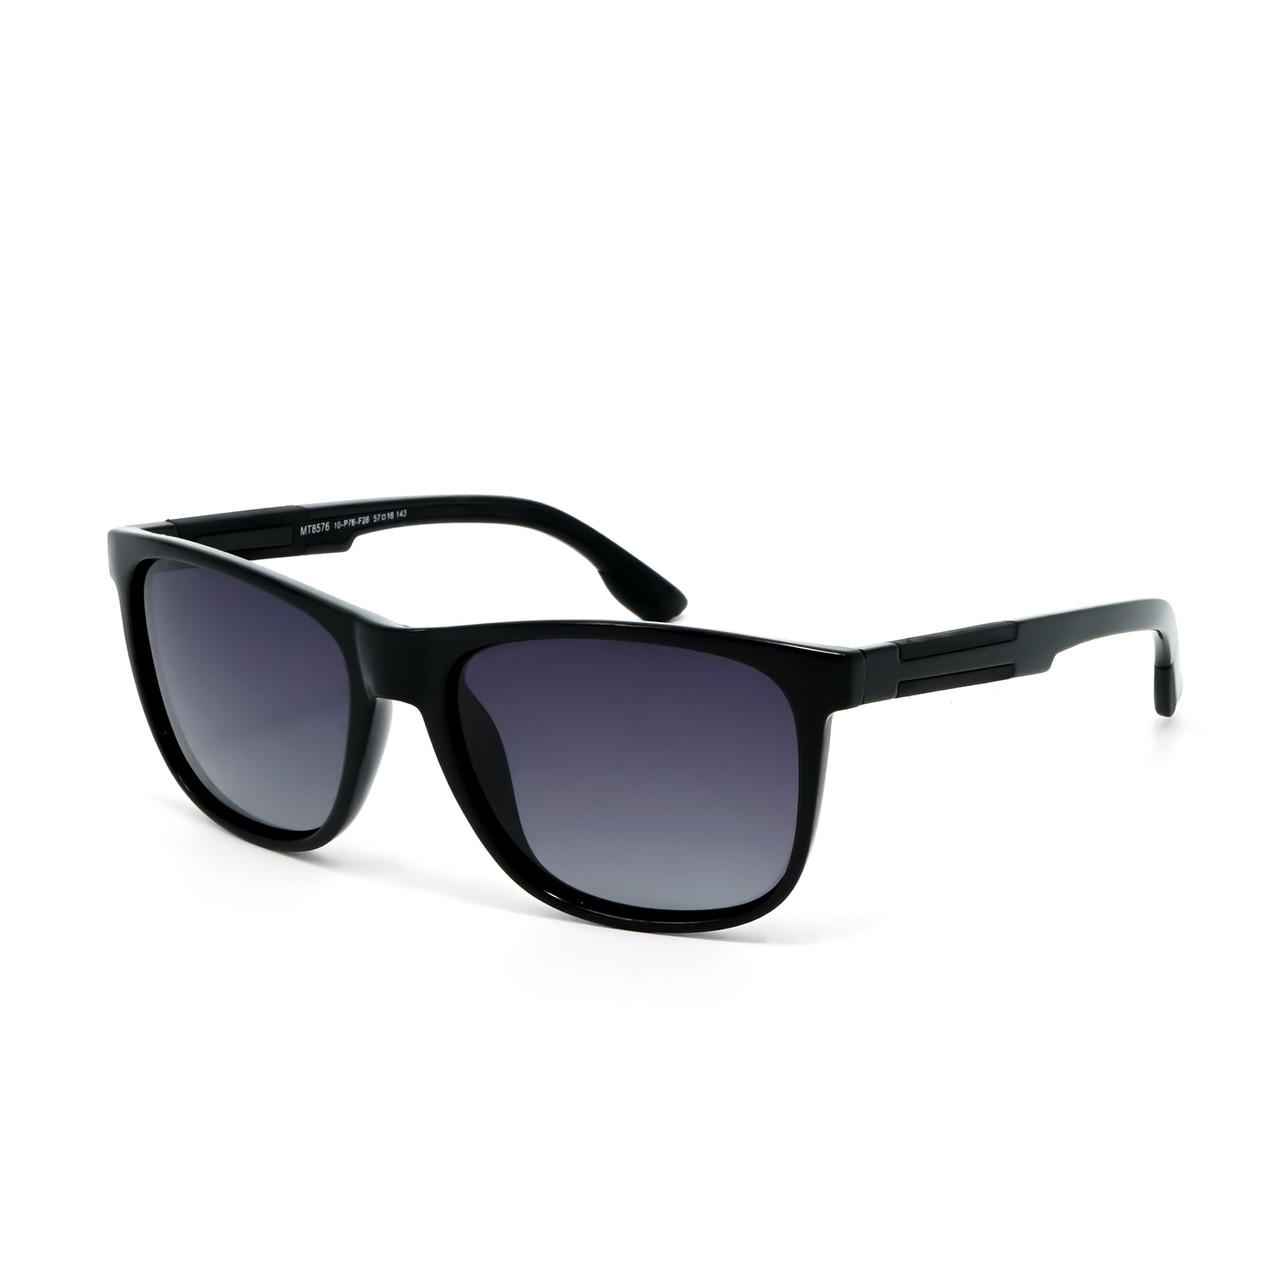 Солнцезащитные очки Matrix MT8576 10-P76-F26 глянцевые     ( MT8576-10-P76-F26 )